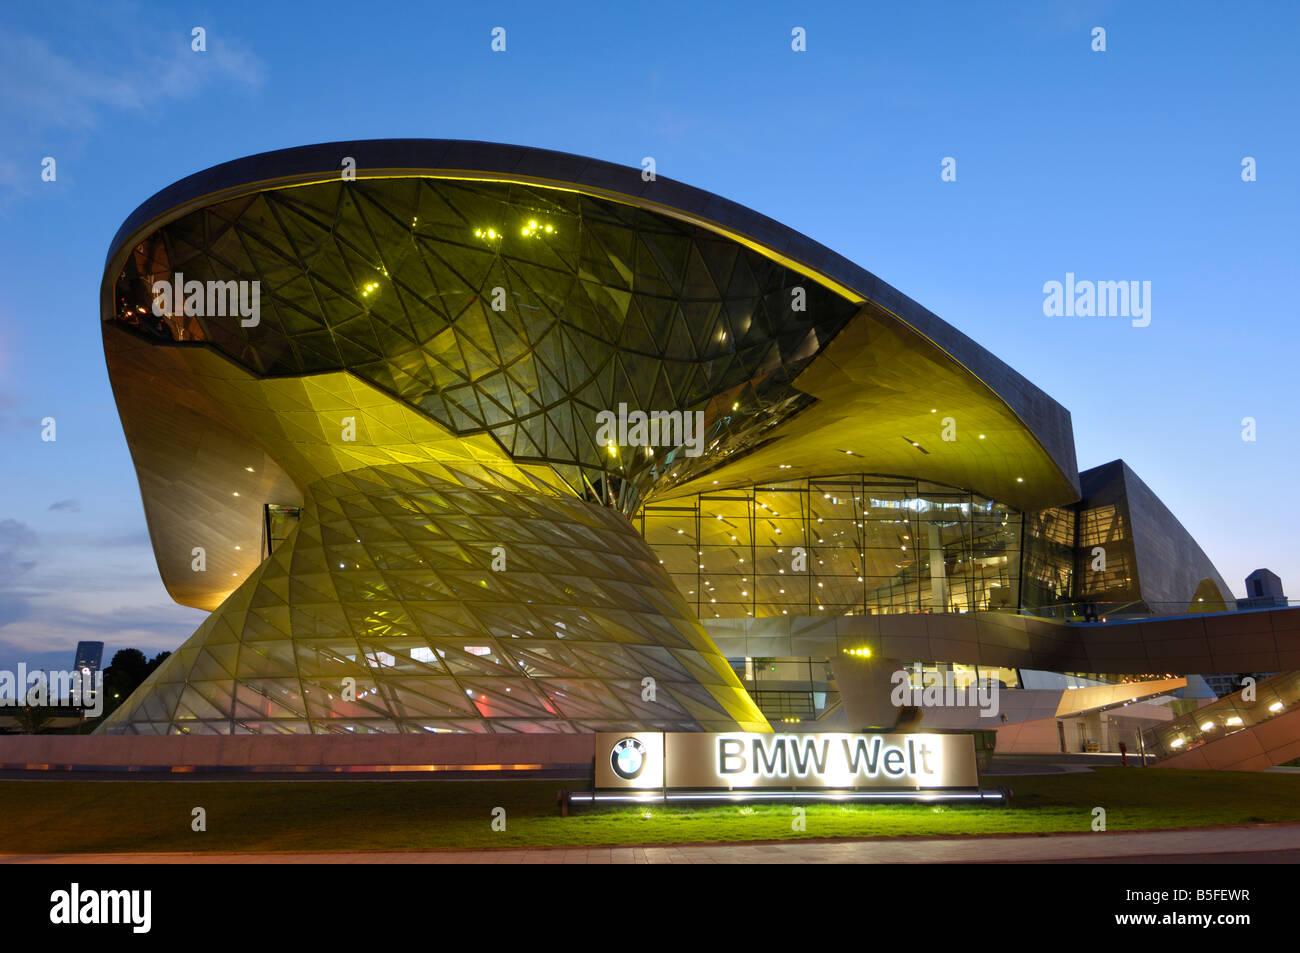 BMW Welt illuminated at night, Munich, Munchen, Bavaria, Germany - Stock Image